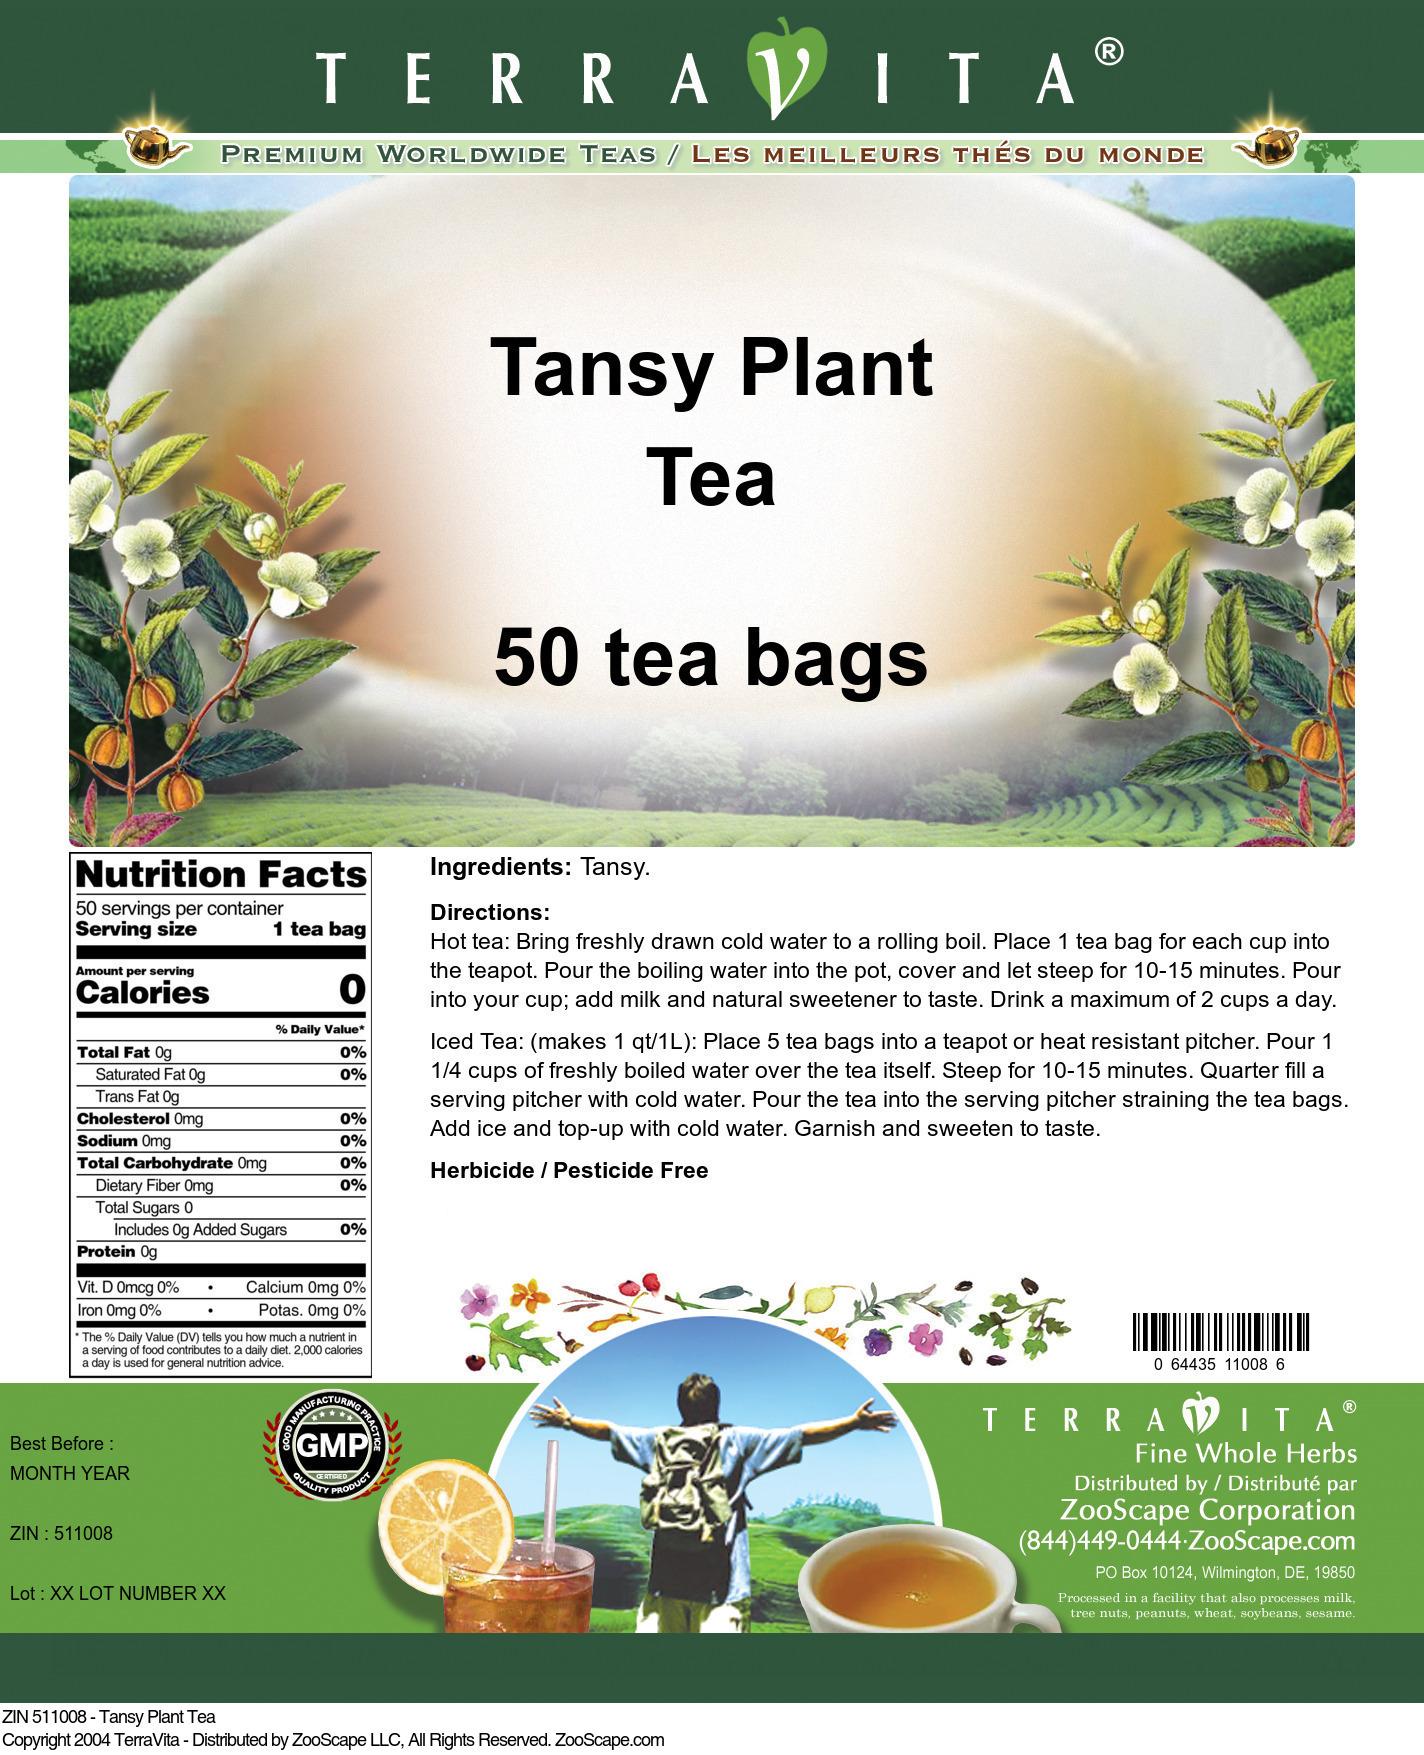 Tansy Plant